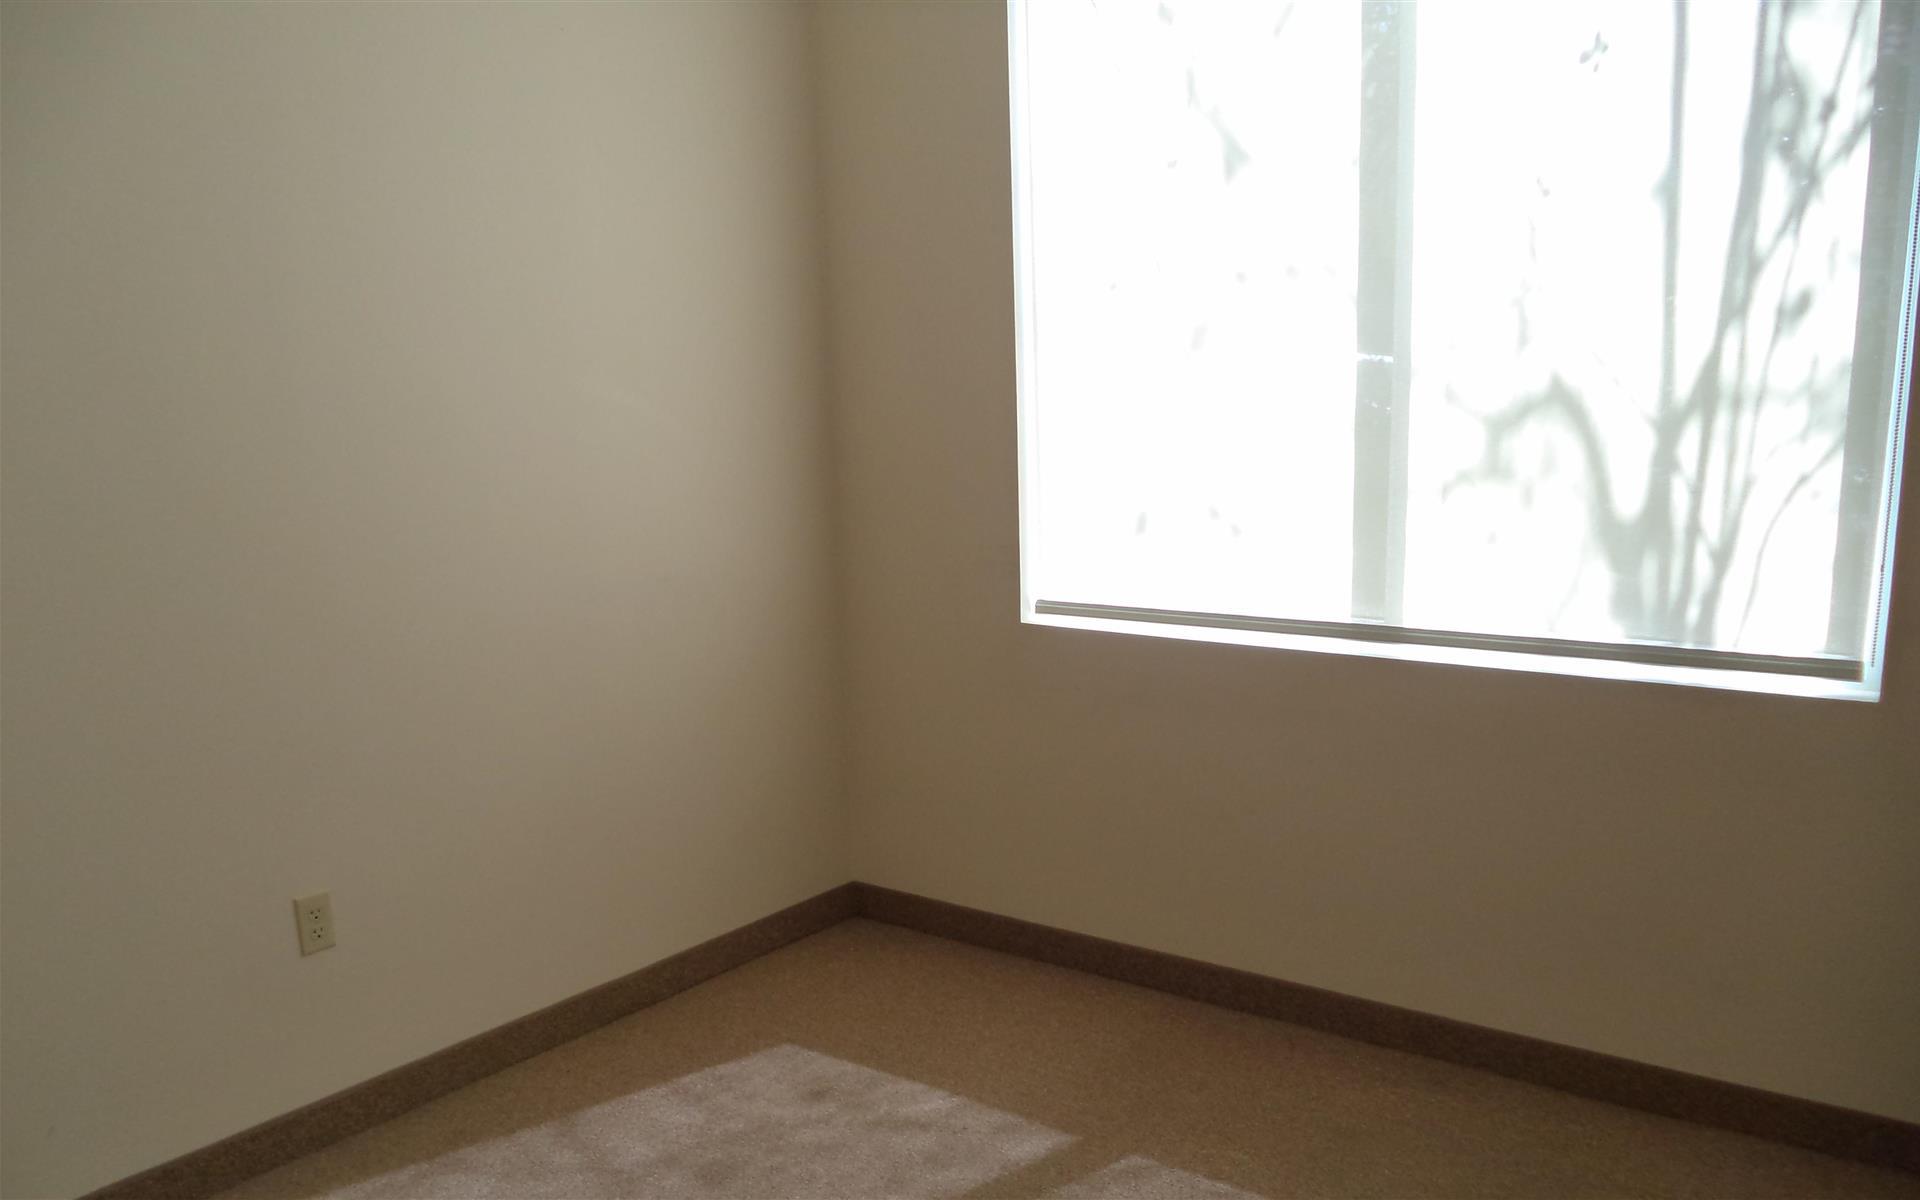 Eiglarsh Executive Offices-Weston, FL - Office Suite-South Exterior 1st Floor